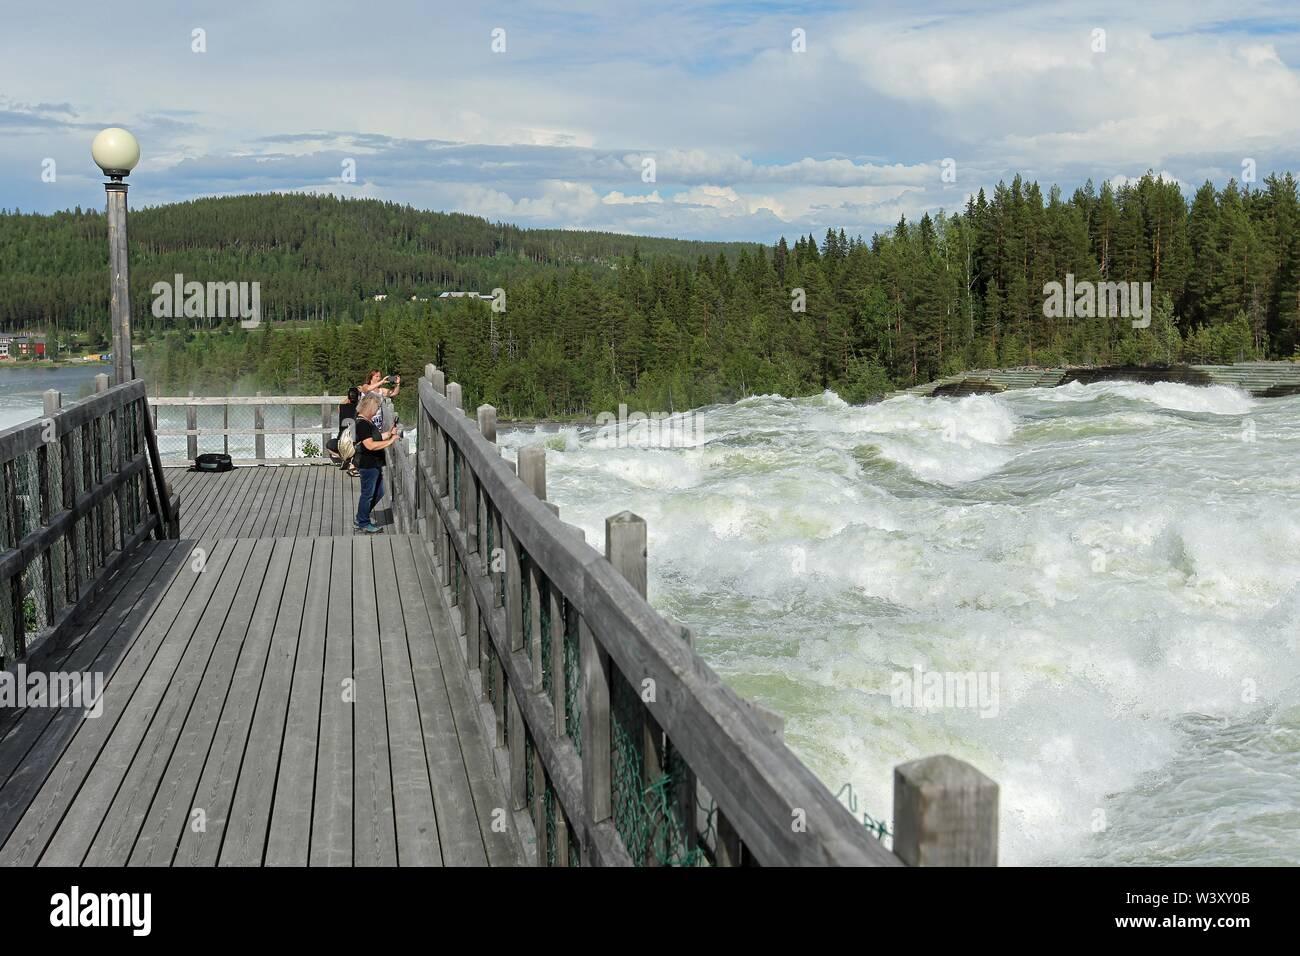 Tourists at the rapids Storforsen in the river Pitealven, Vidsel, Lapland, Sweden - Stock Image